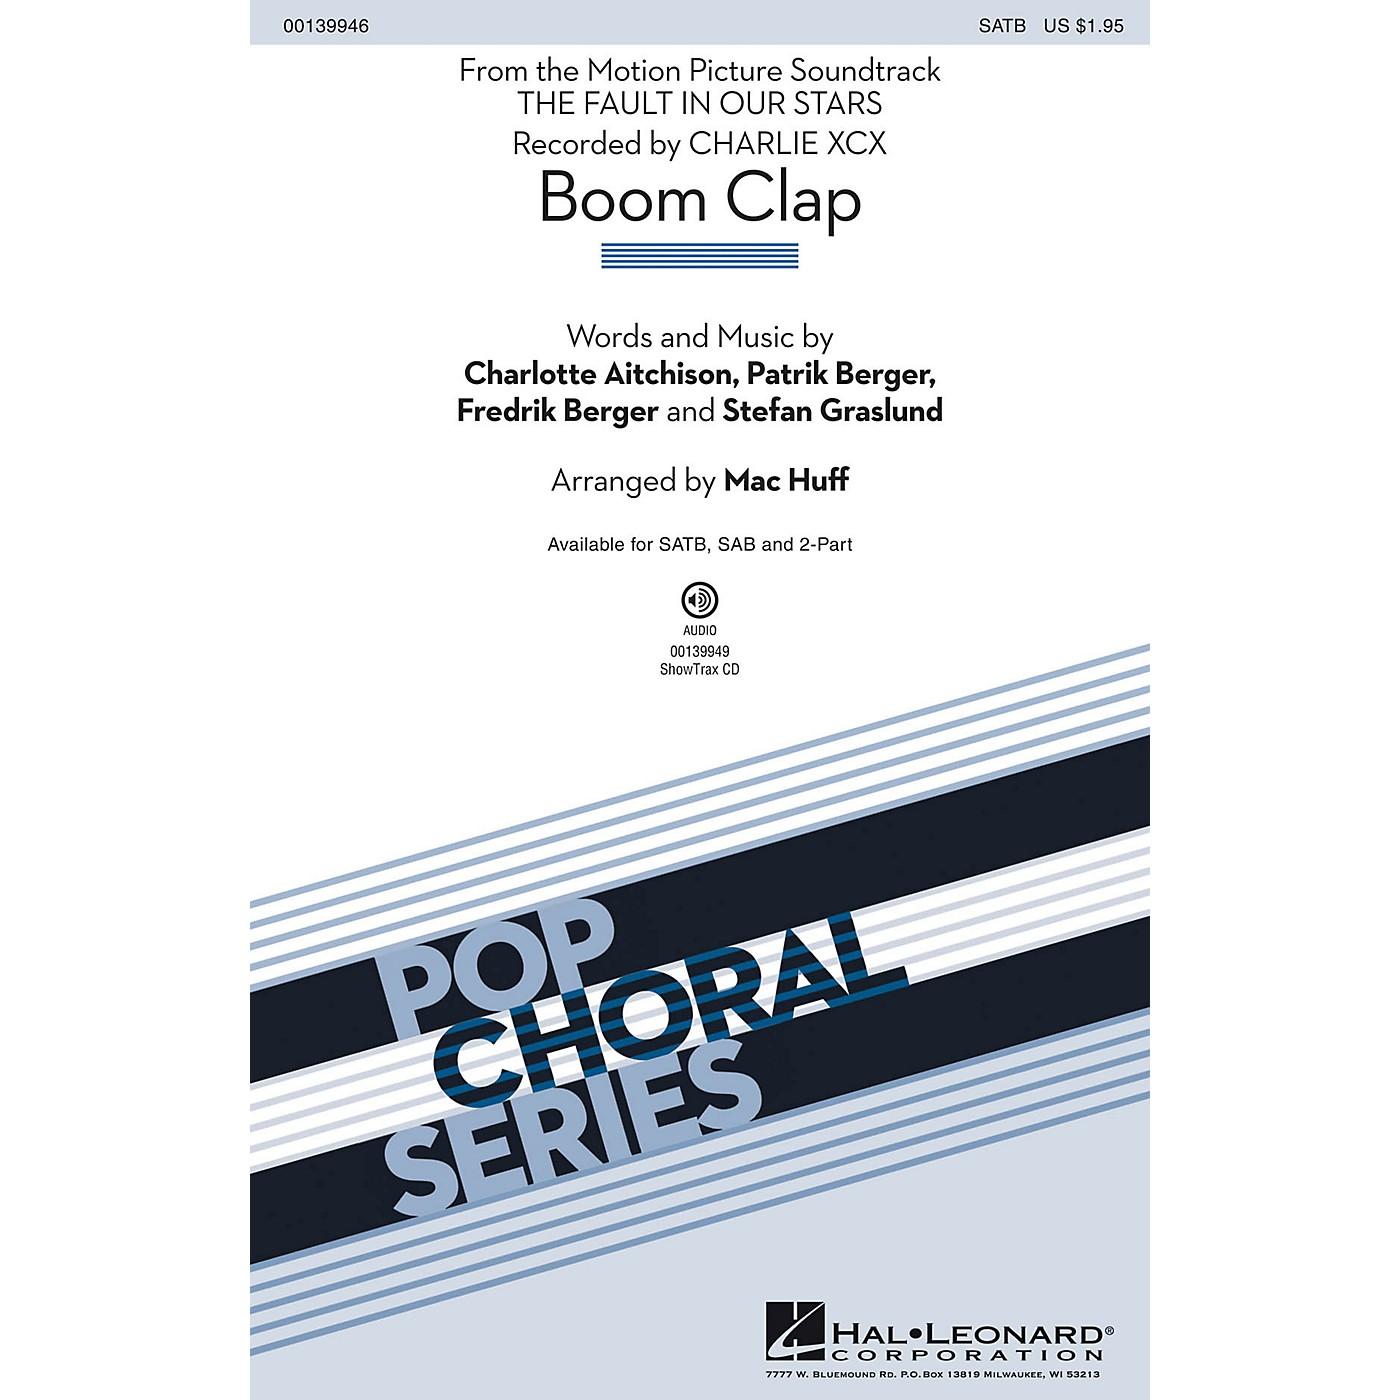 Hal Leonard Boom Clap SATB by Charli XCX arranged by Mac Huff thumbnail